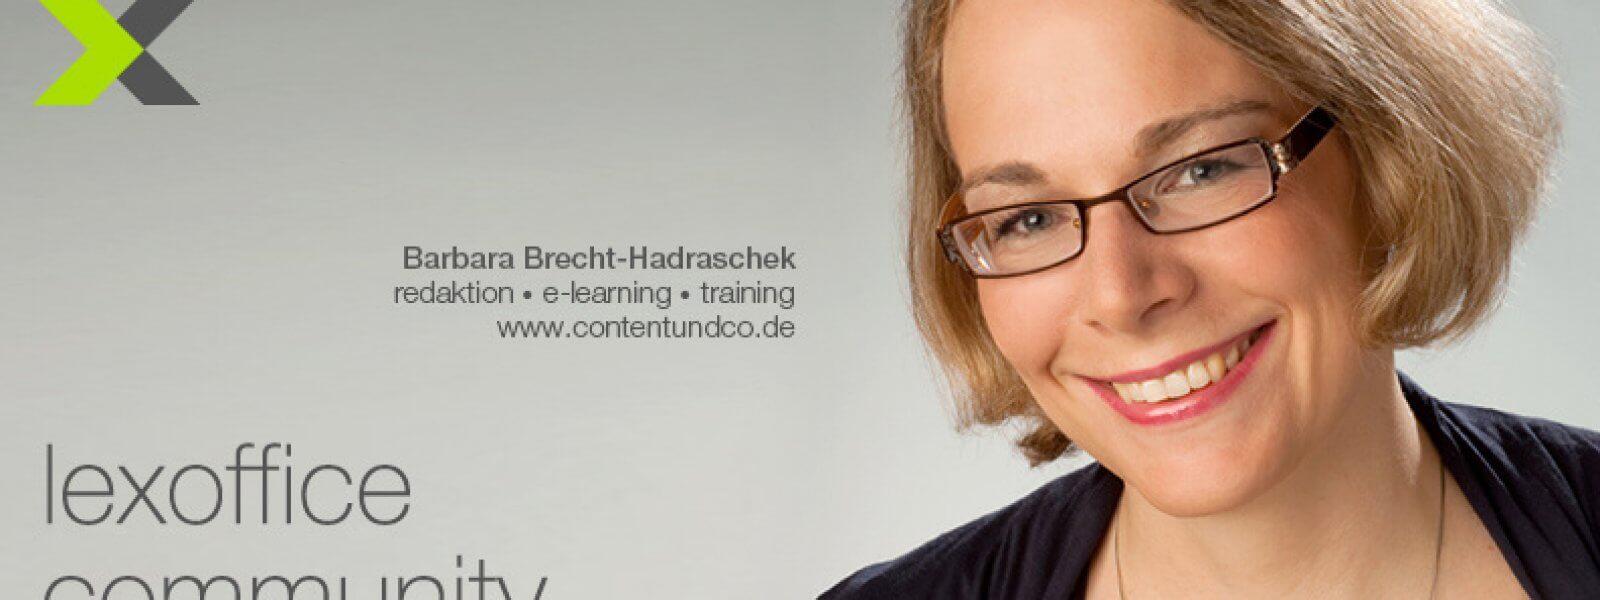 lexoffice Community: User-Interview (23) Barbara Brecht-Hadraschek, contentundco.de